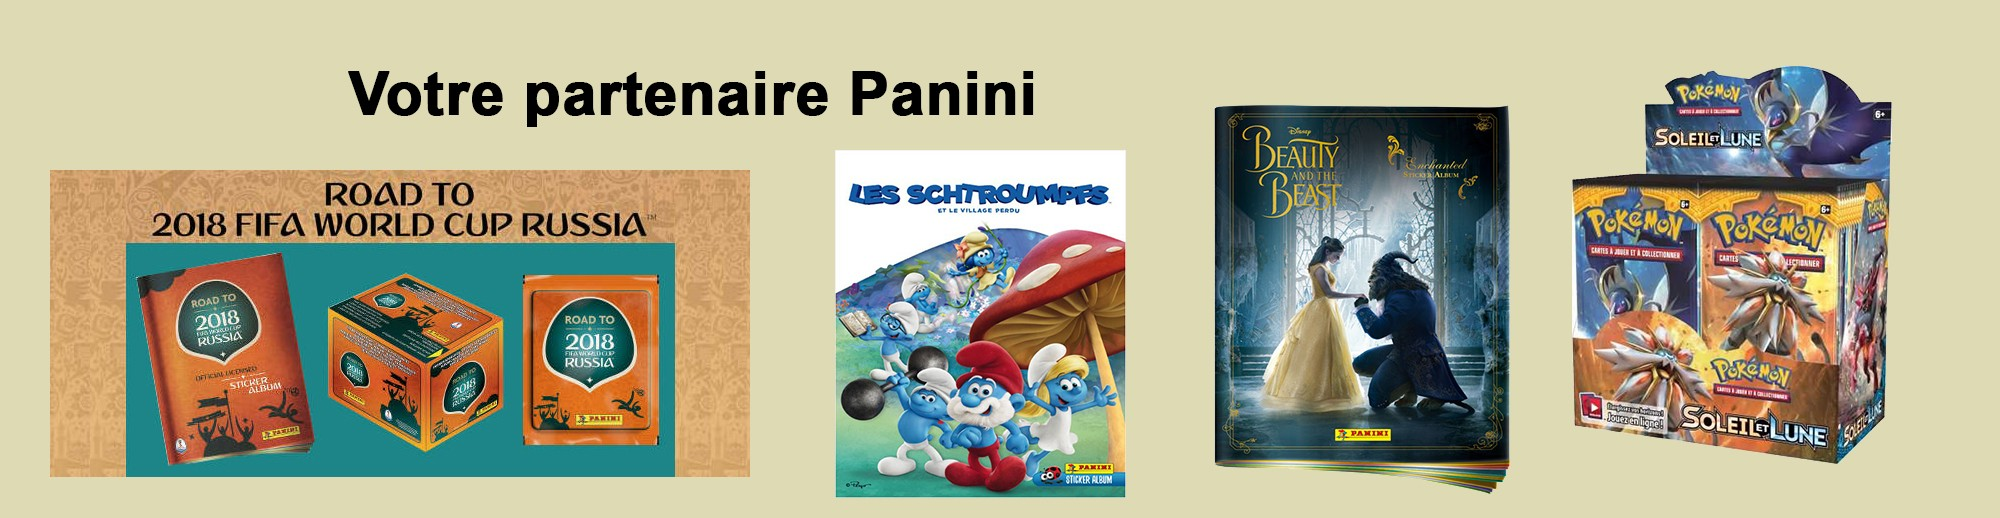 Partenaire PANINI